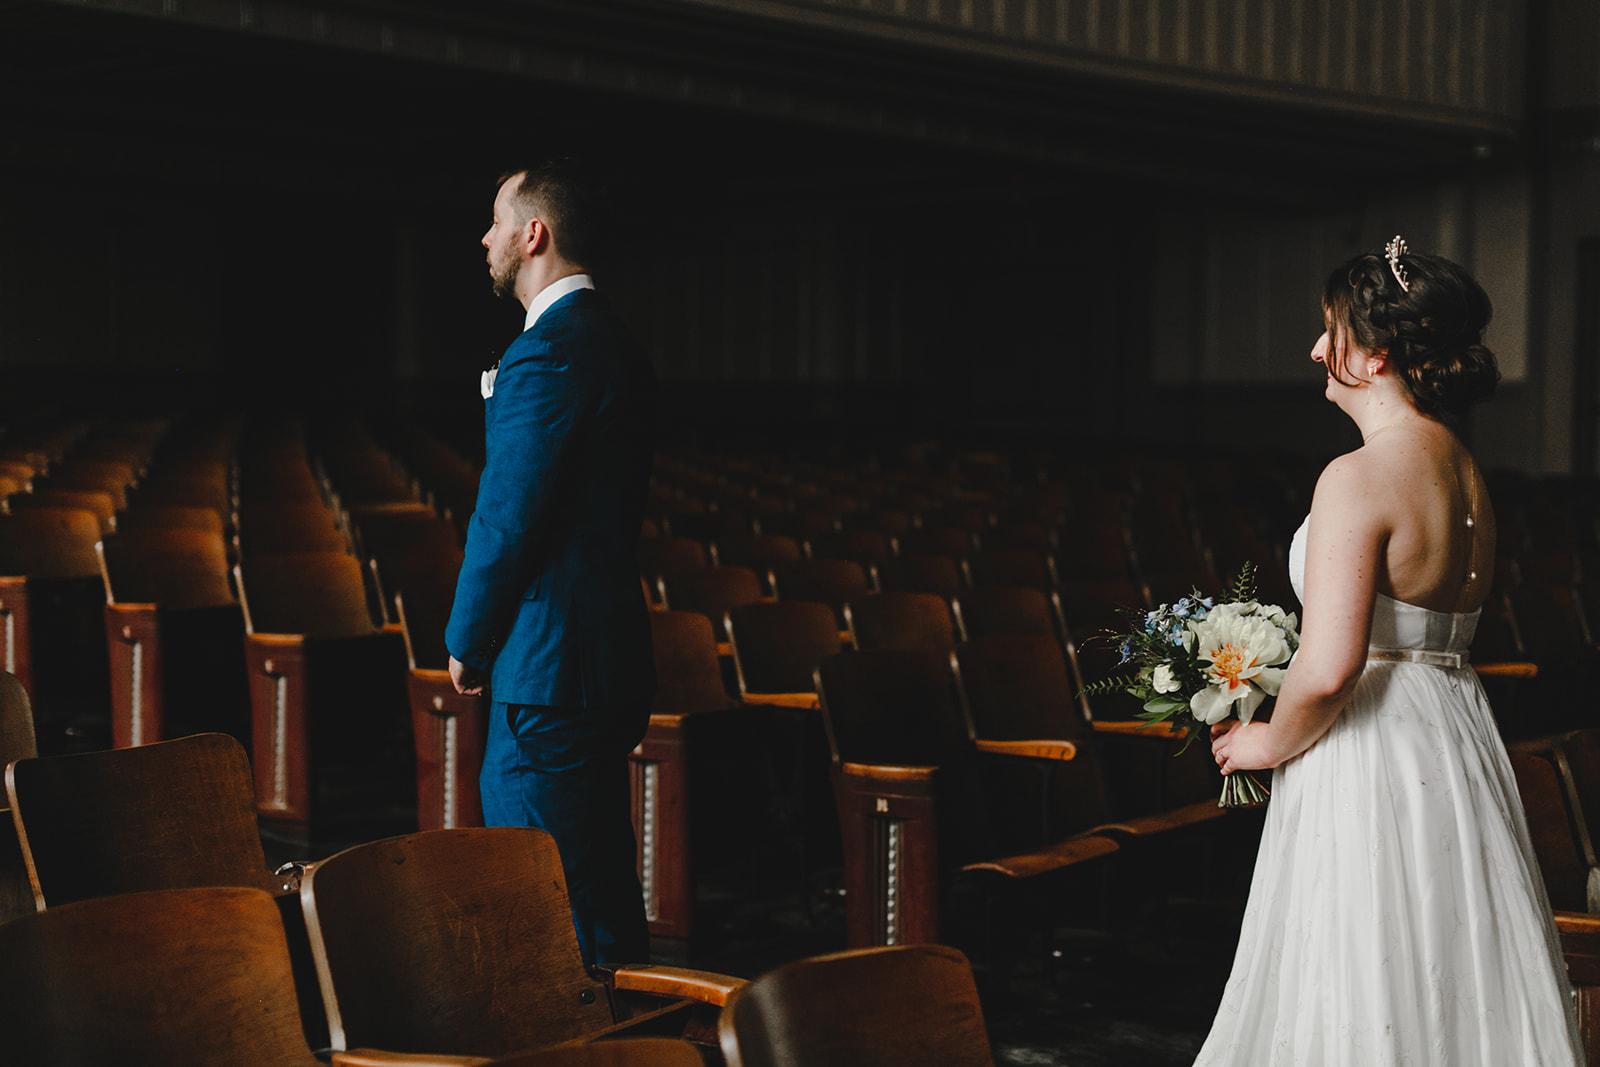 bok-wedding-philadelphia-sarah-rich-12.jpg